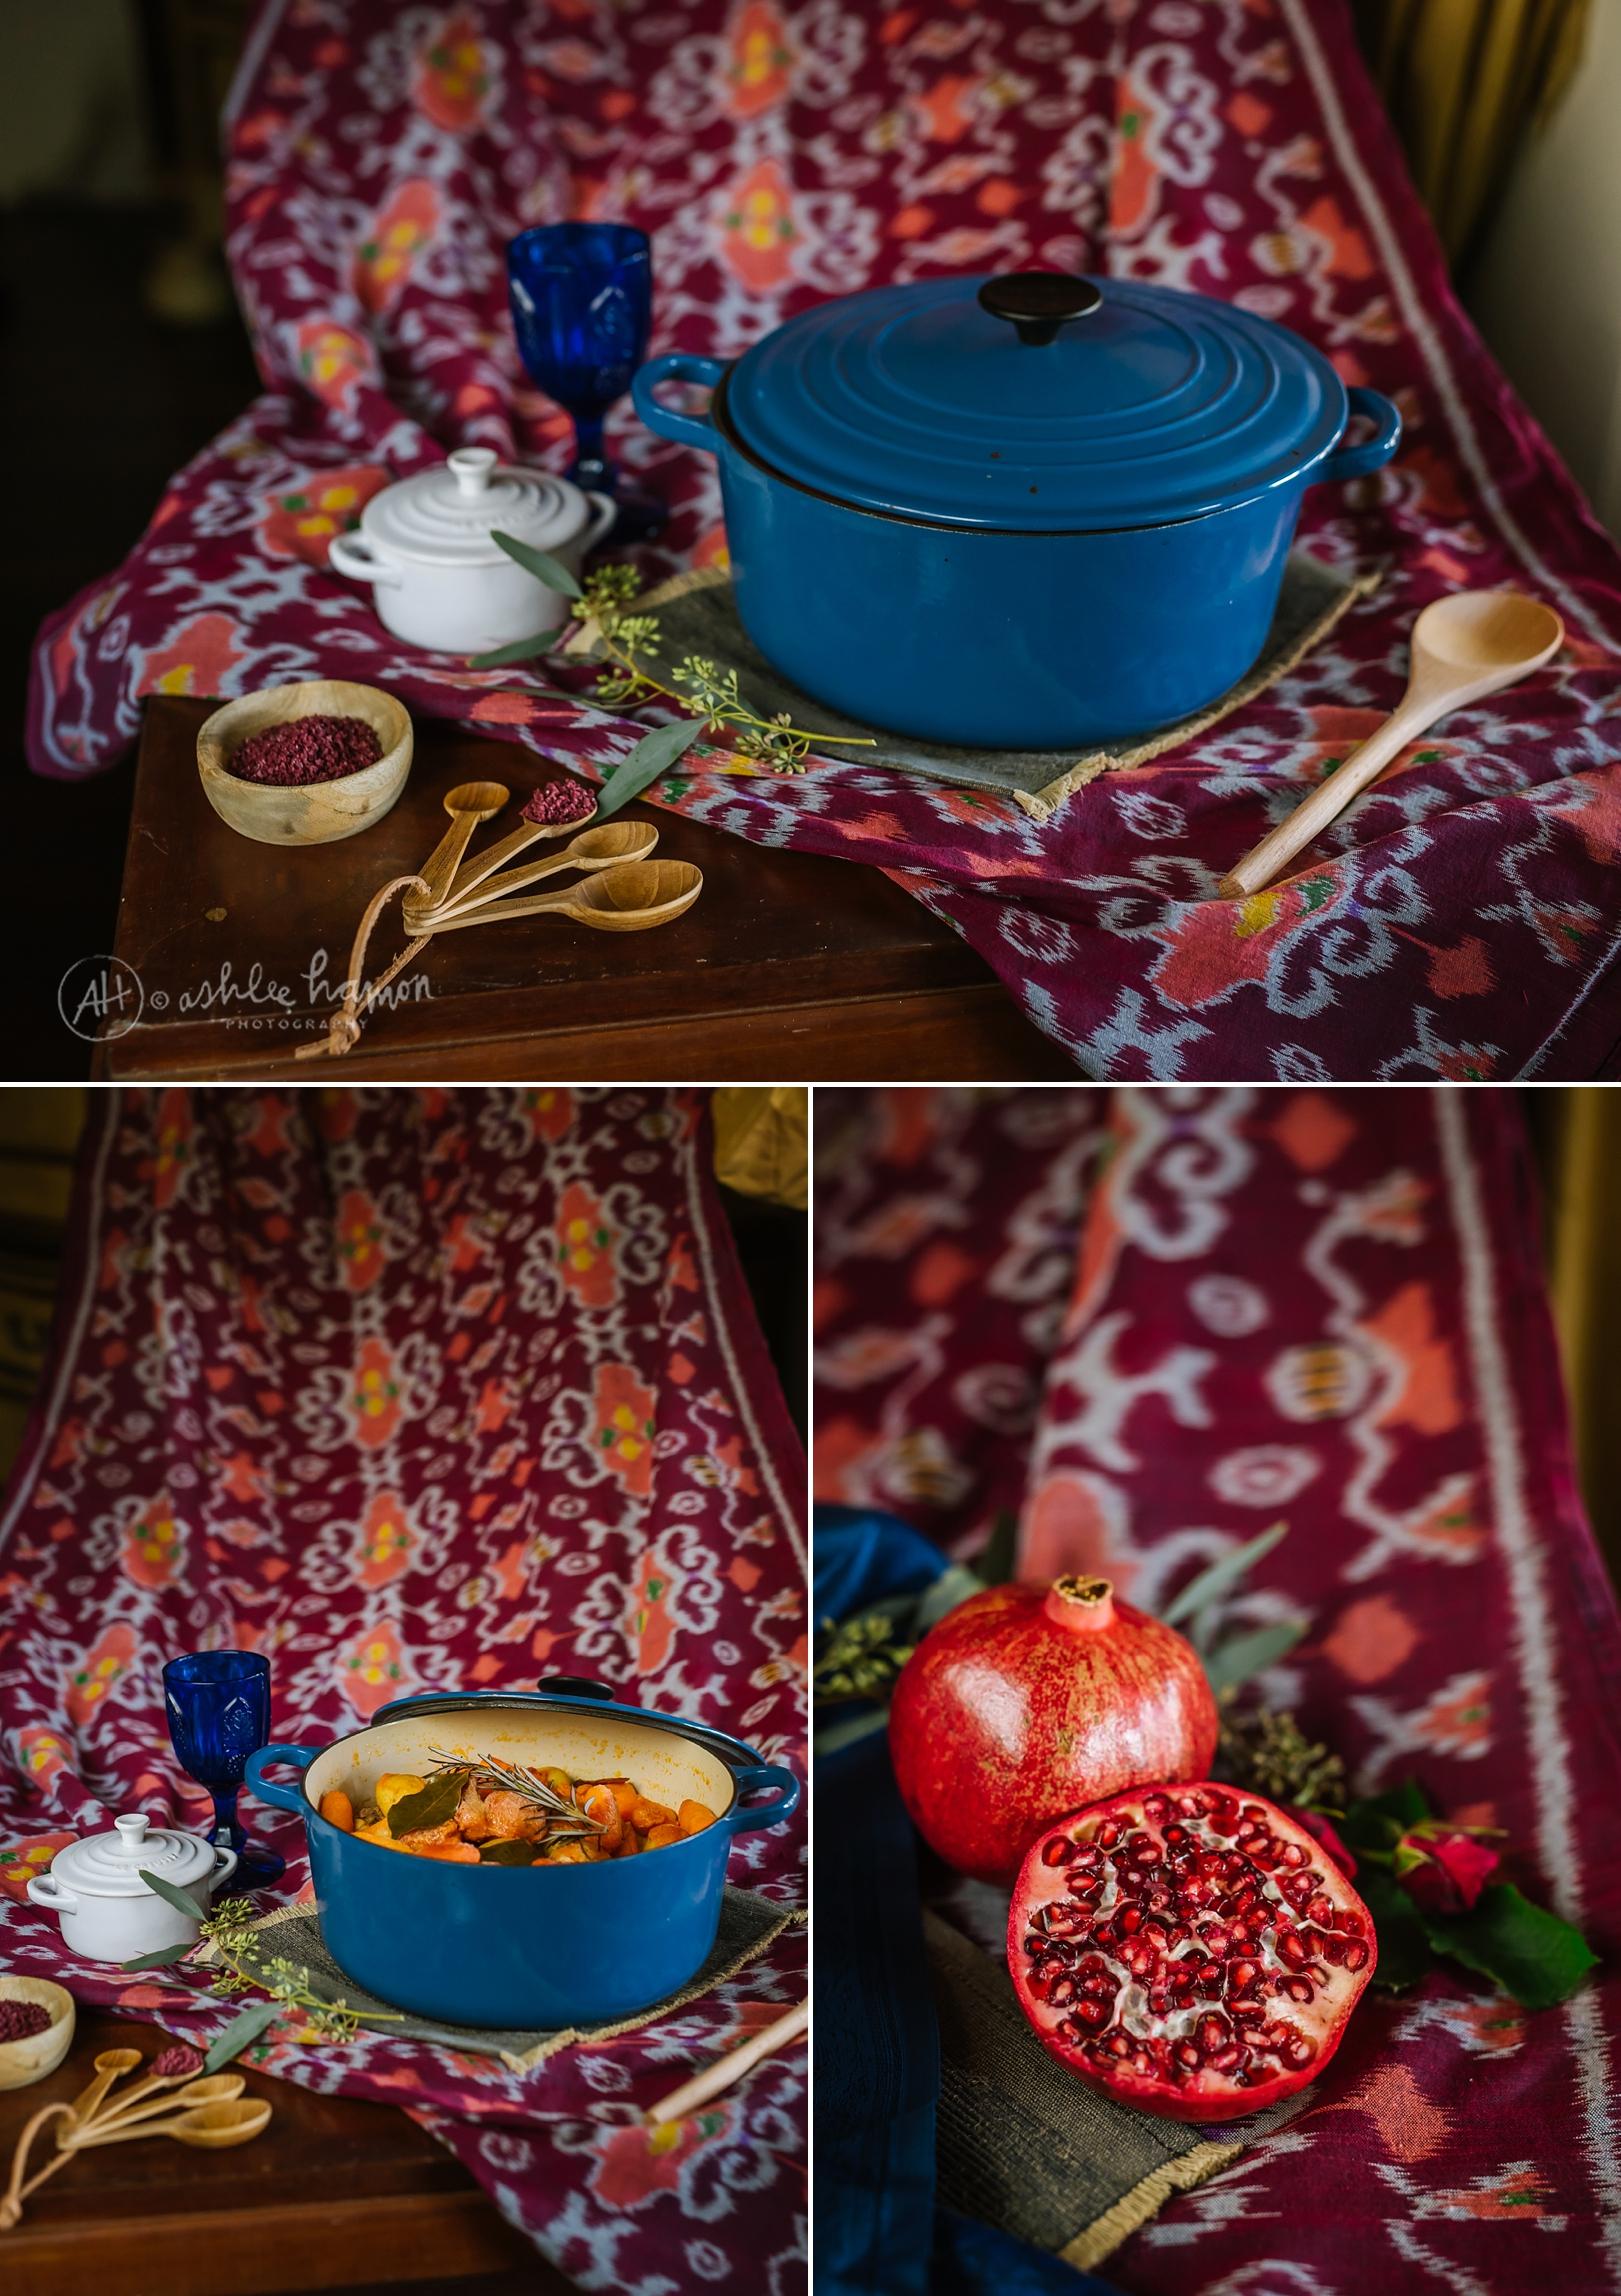 tampa-creative-commercial-food-photographer-ashlee-hamon_0000.jpg